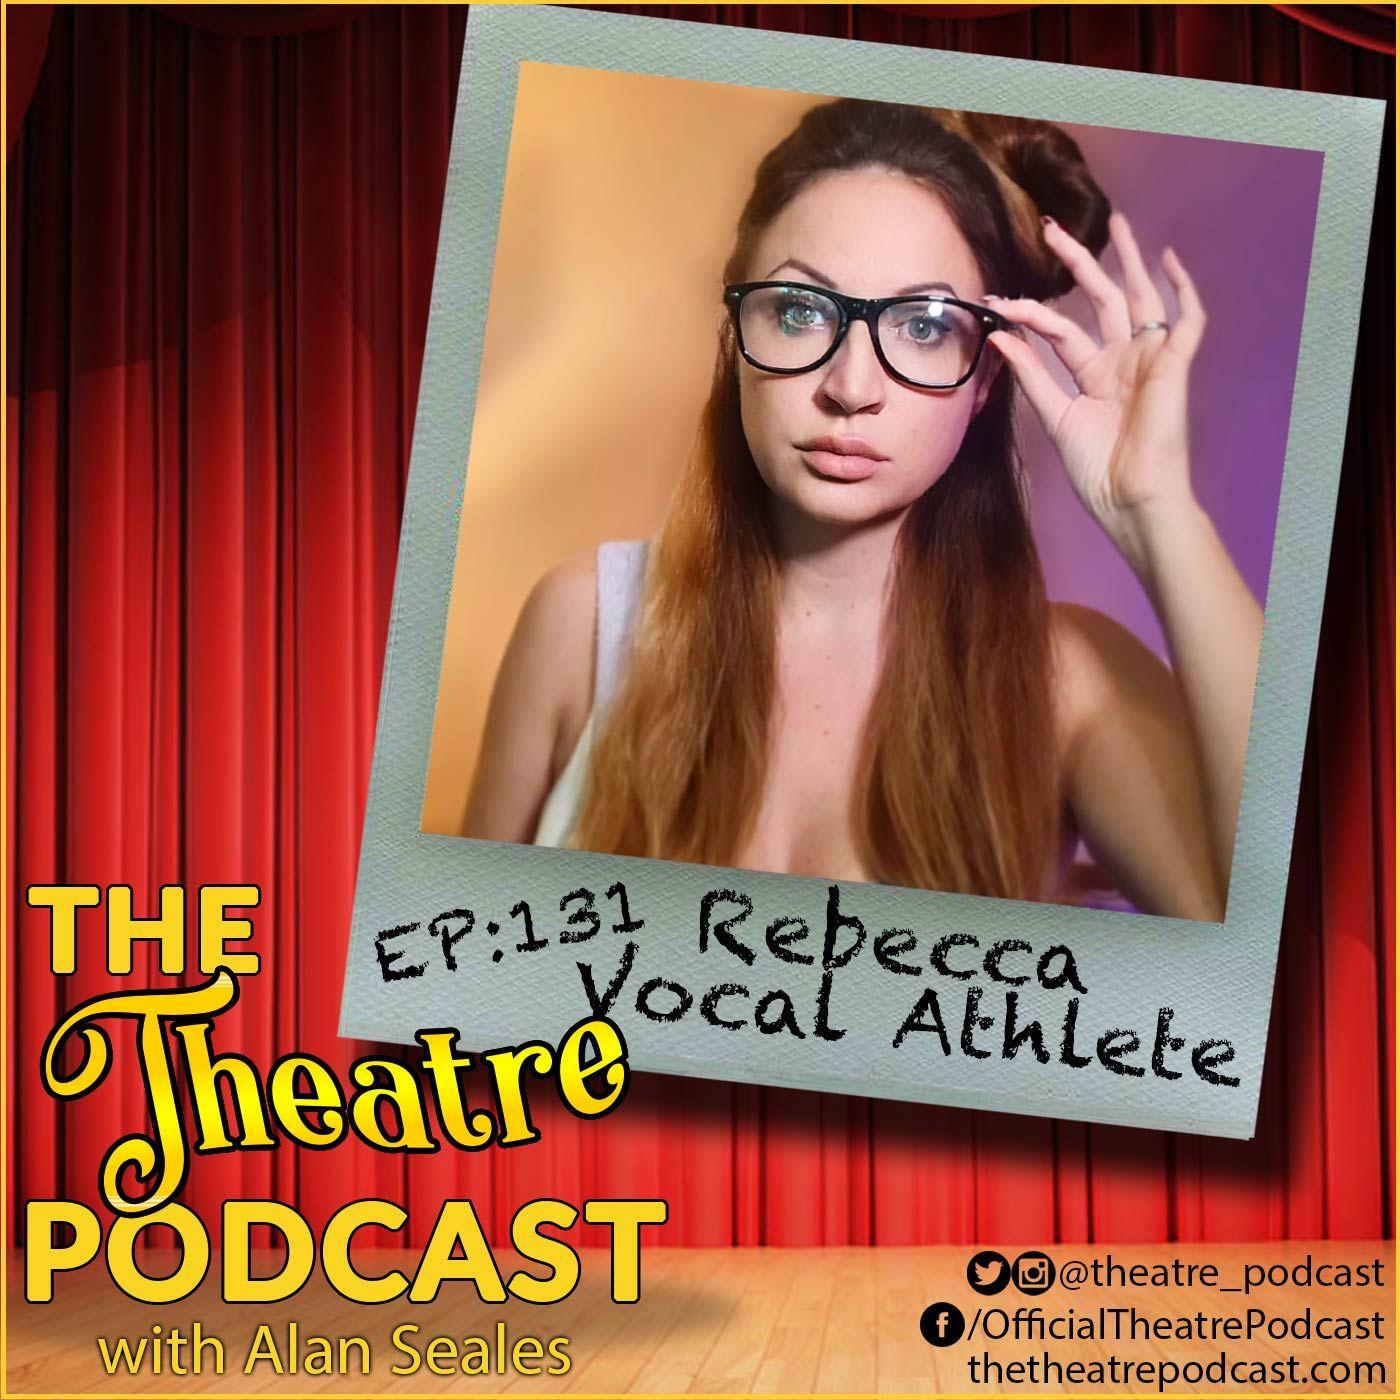 Ep131 - Rebecca Vocal Athlete: YouTube Star, Vocal Coach, Theatre Lover